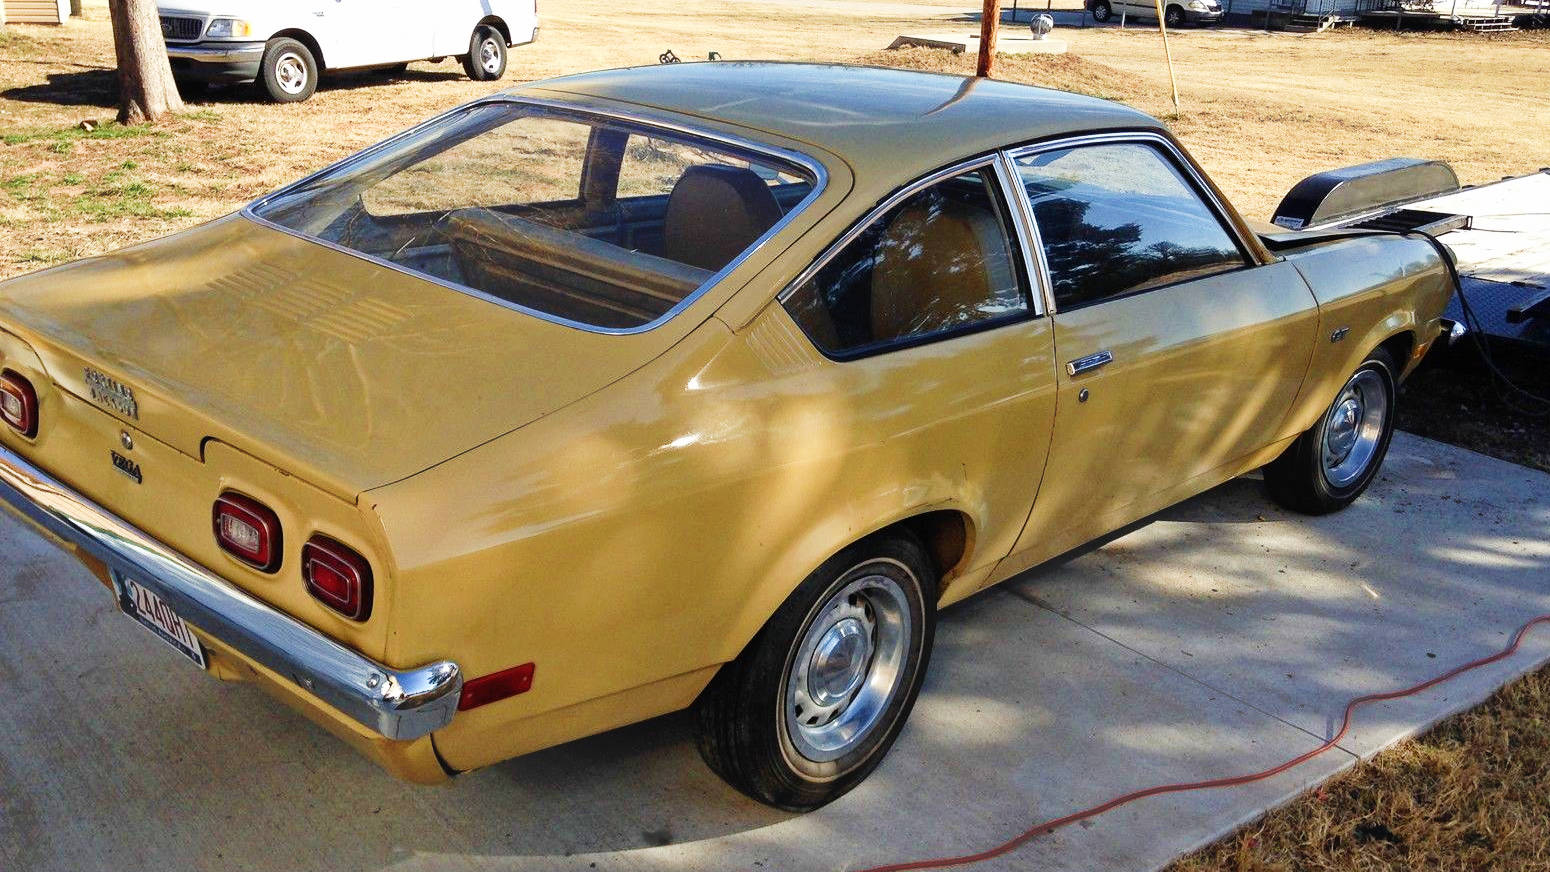 Image - 1973 Vega GT - Classic Car March 2014.jpg | Chevy Vega ...